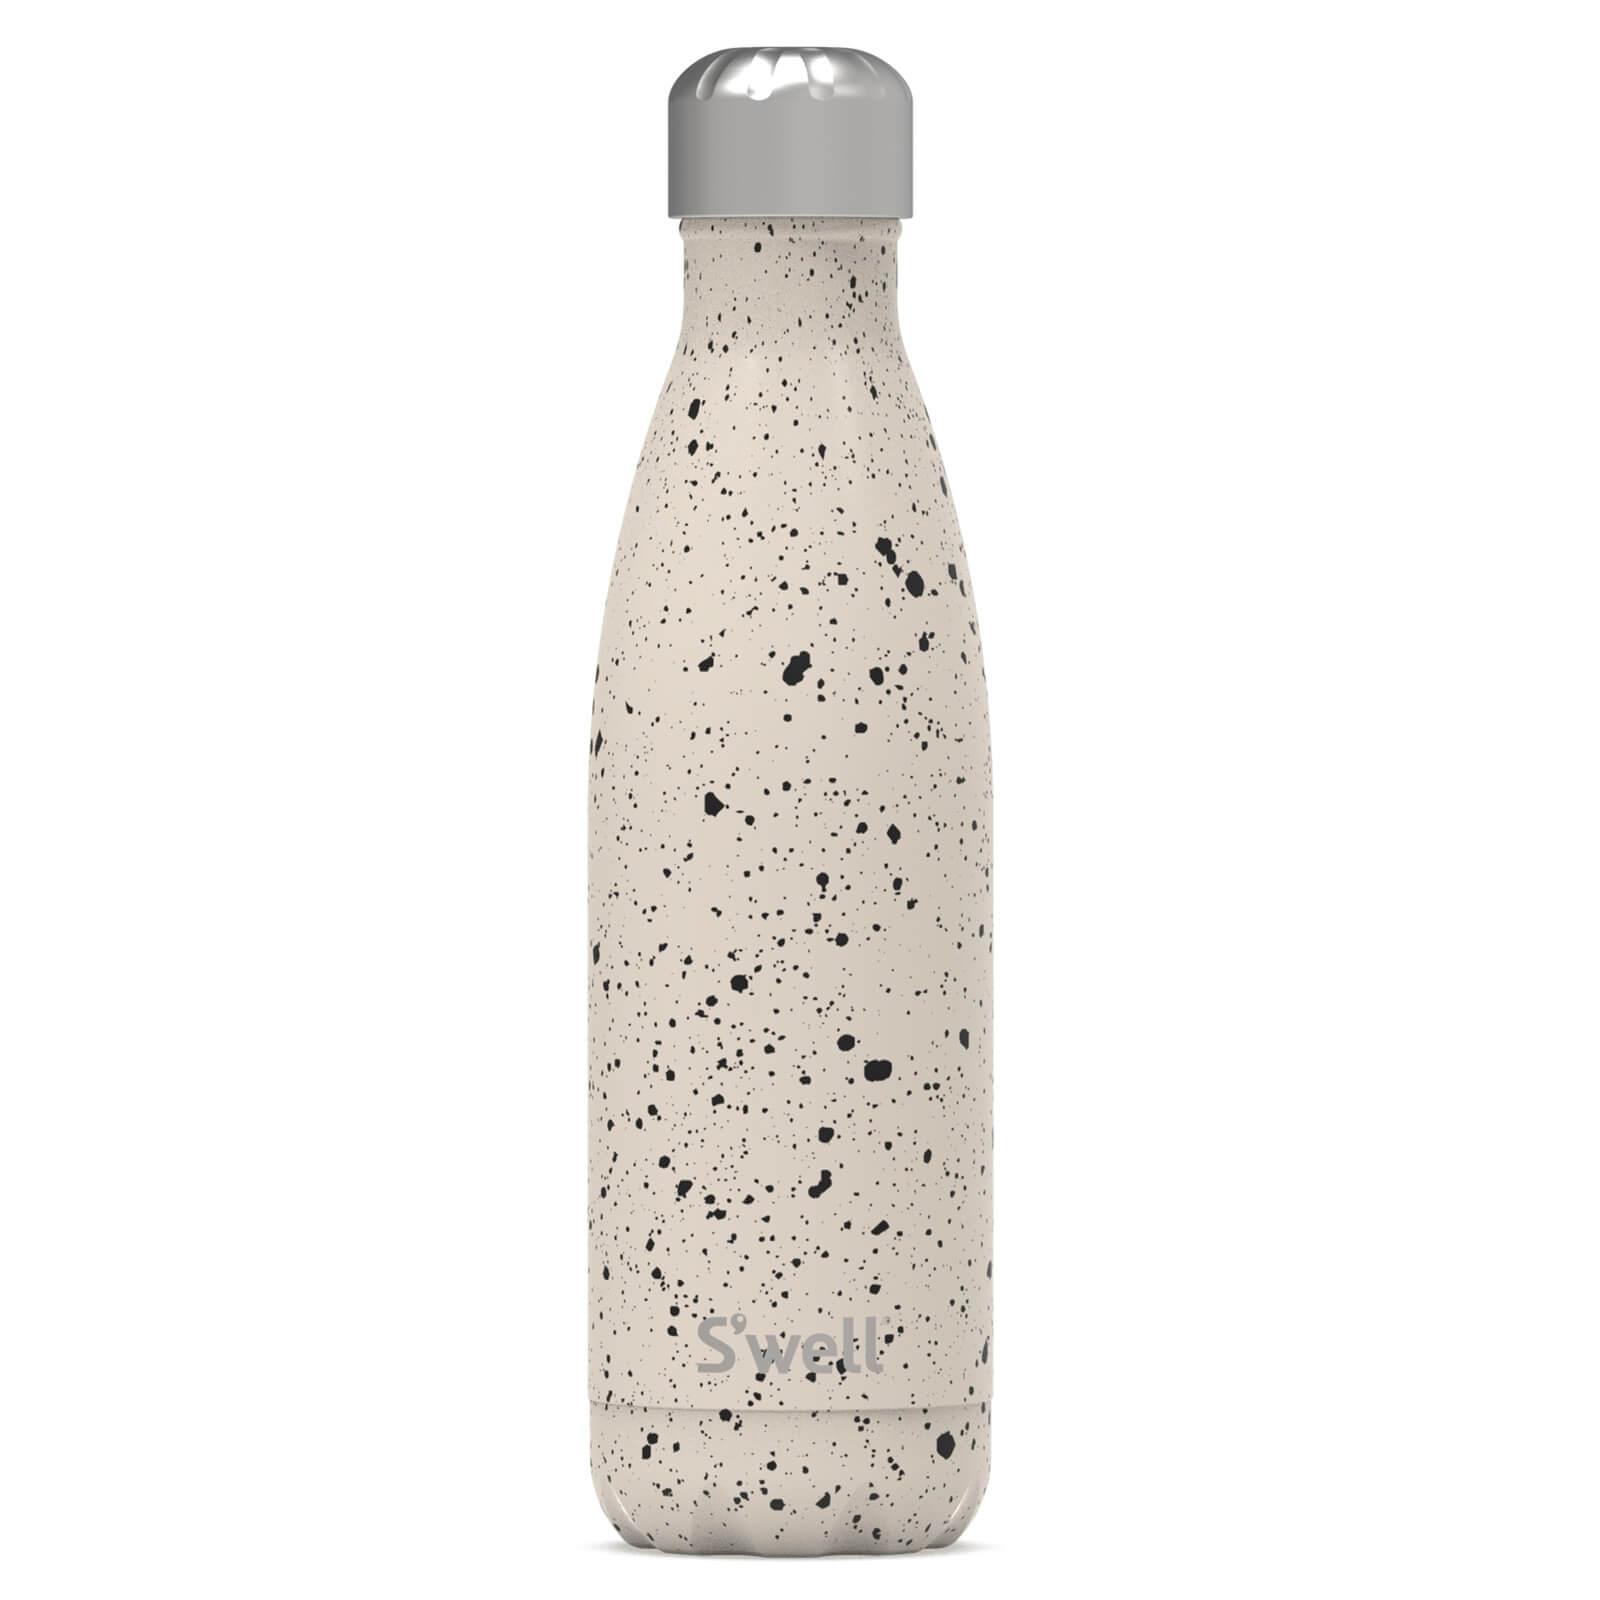 S'well Speckled Moon Water Bottle - 500ml